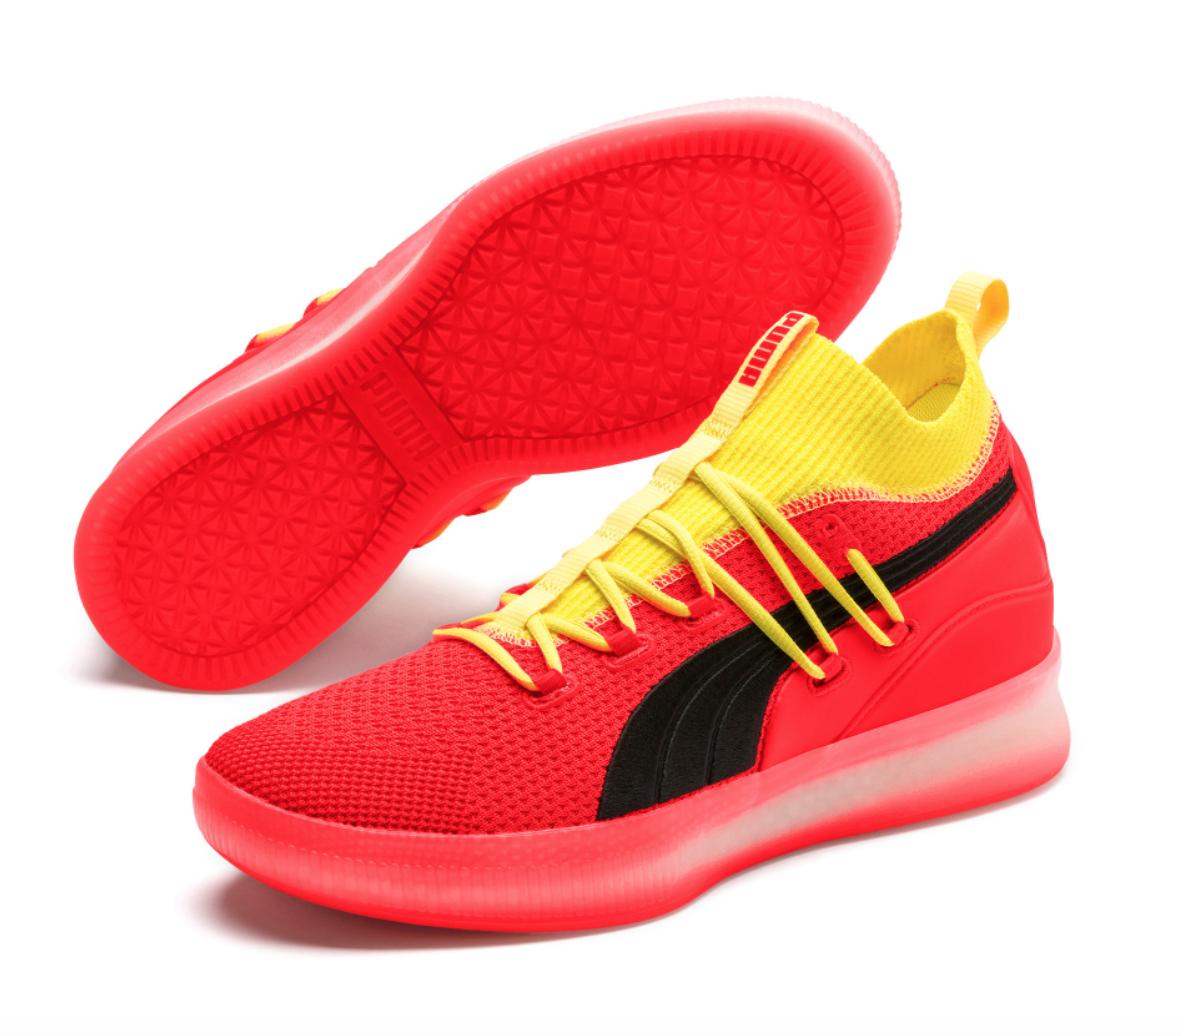 55b8435473f Puma CLYDE COURT Disrupt Red Blast Yellow Black Orange Basketball ...